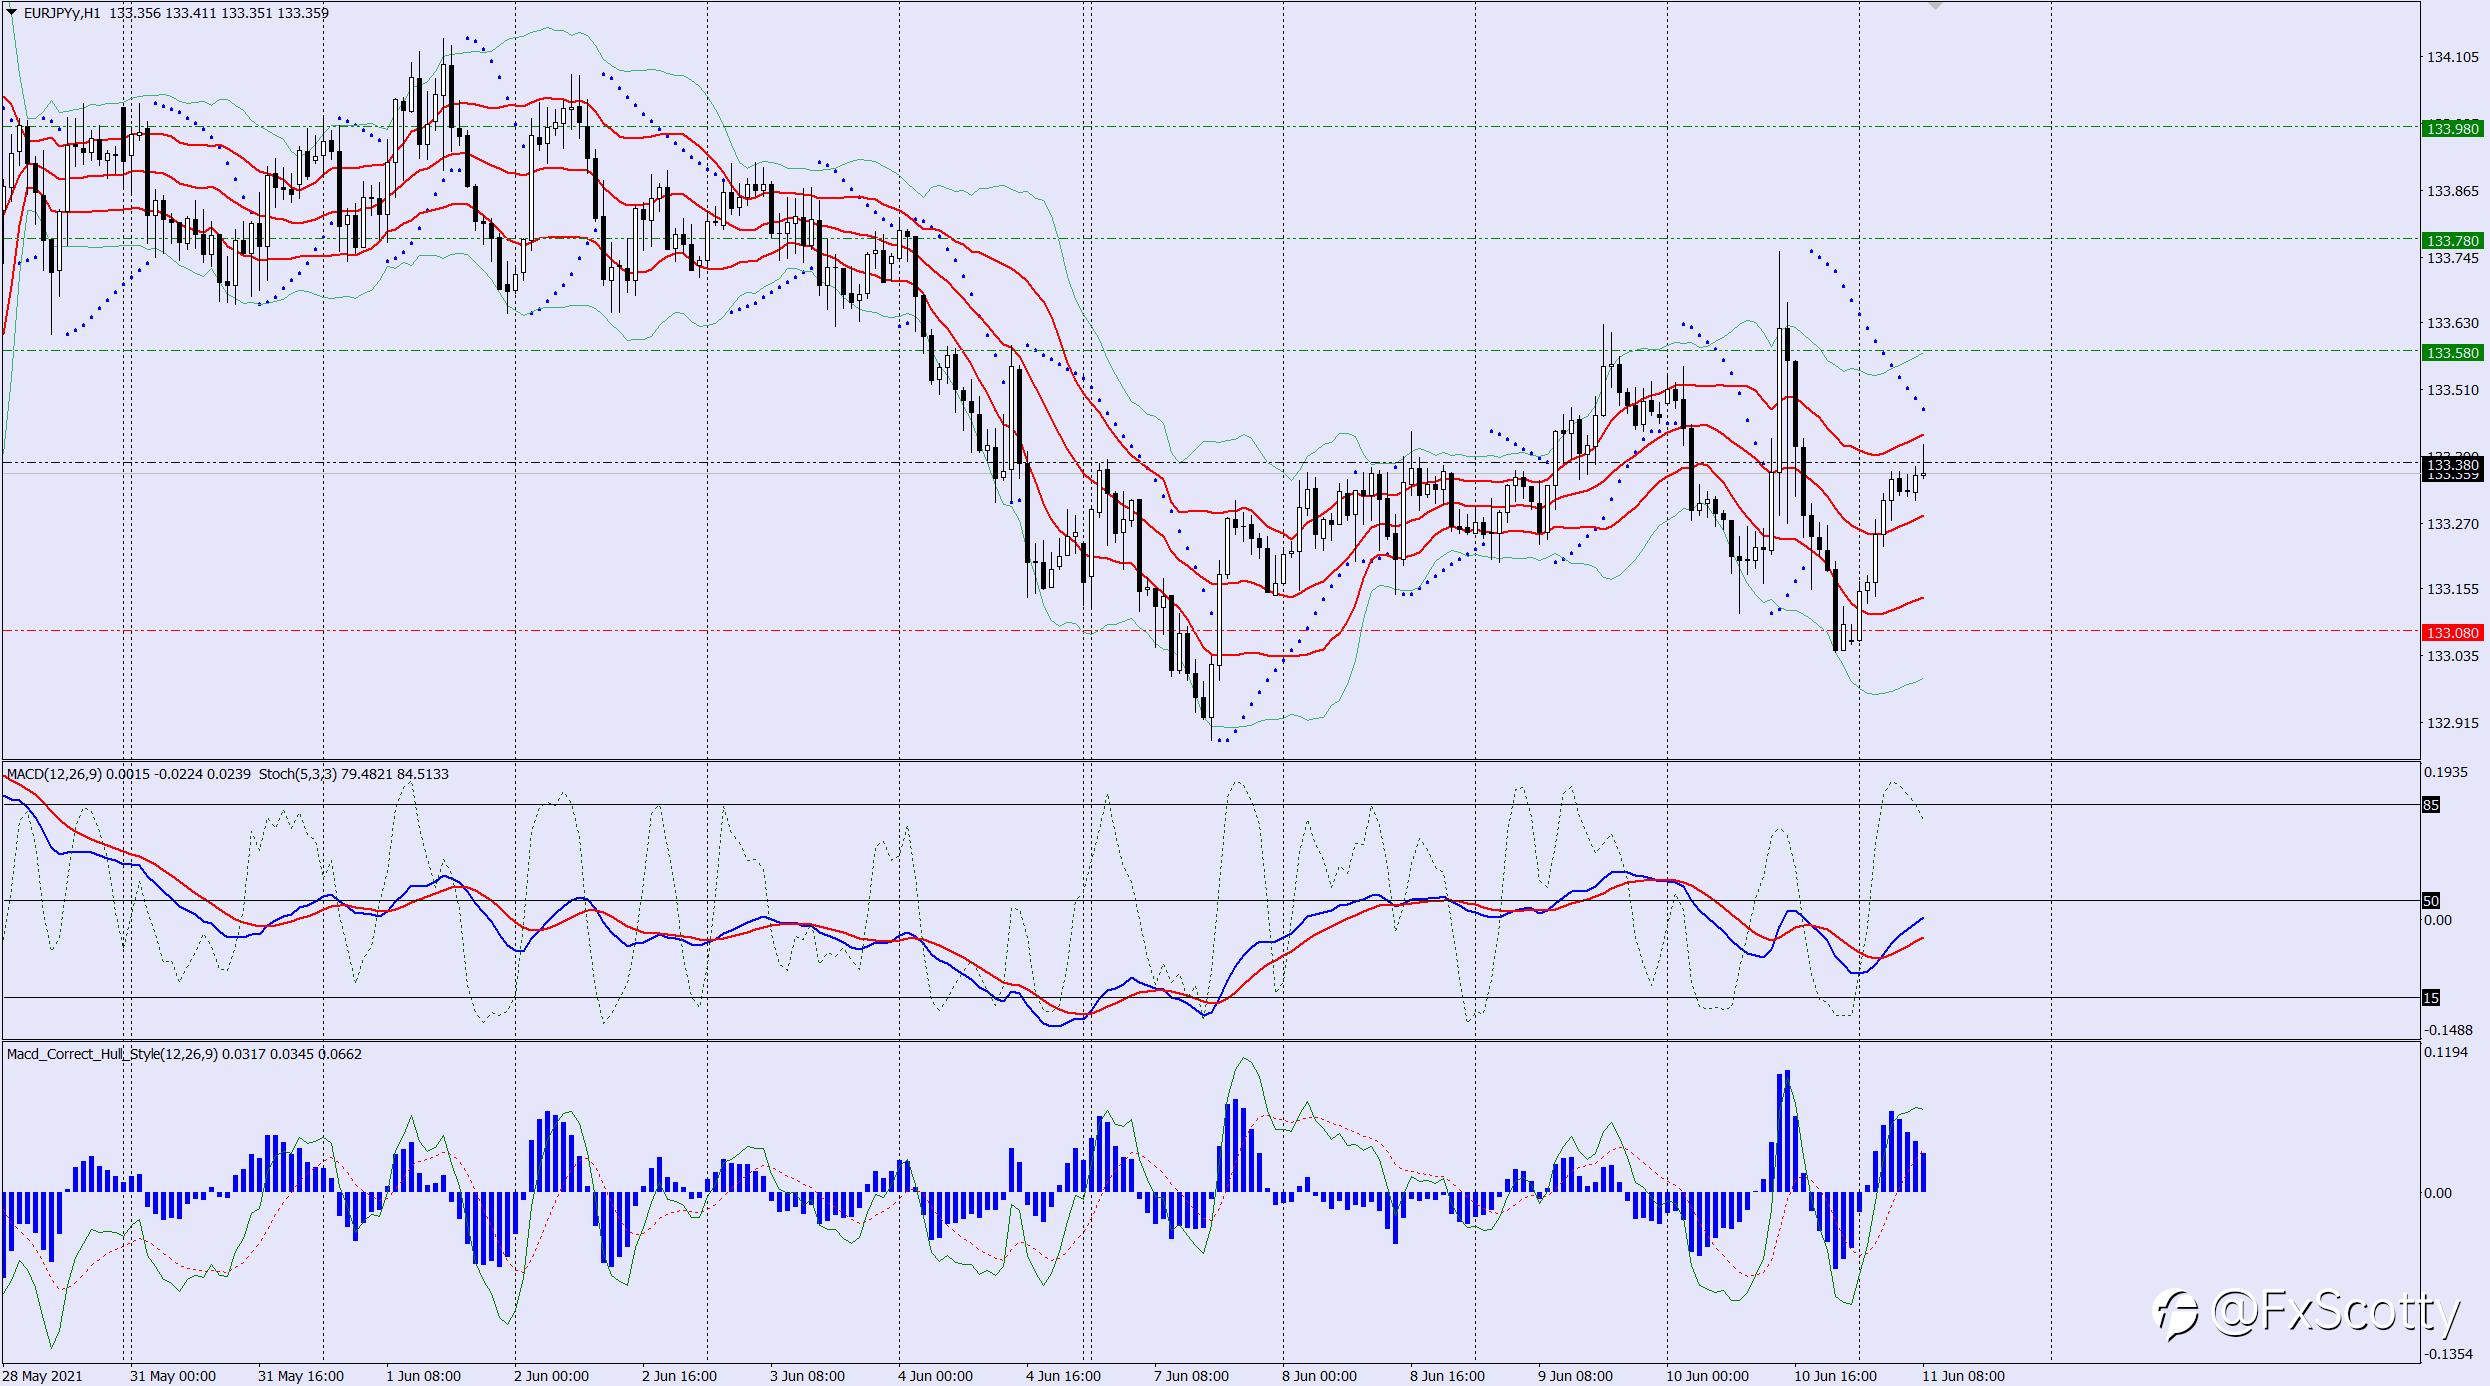 EURJPY buy trade idea 11 06 2021